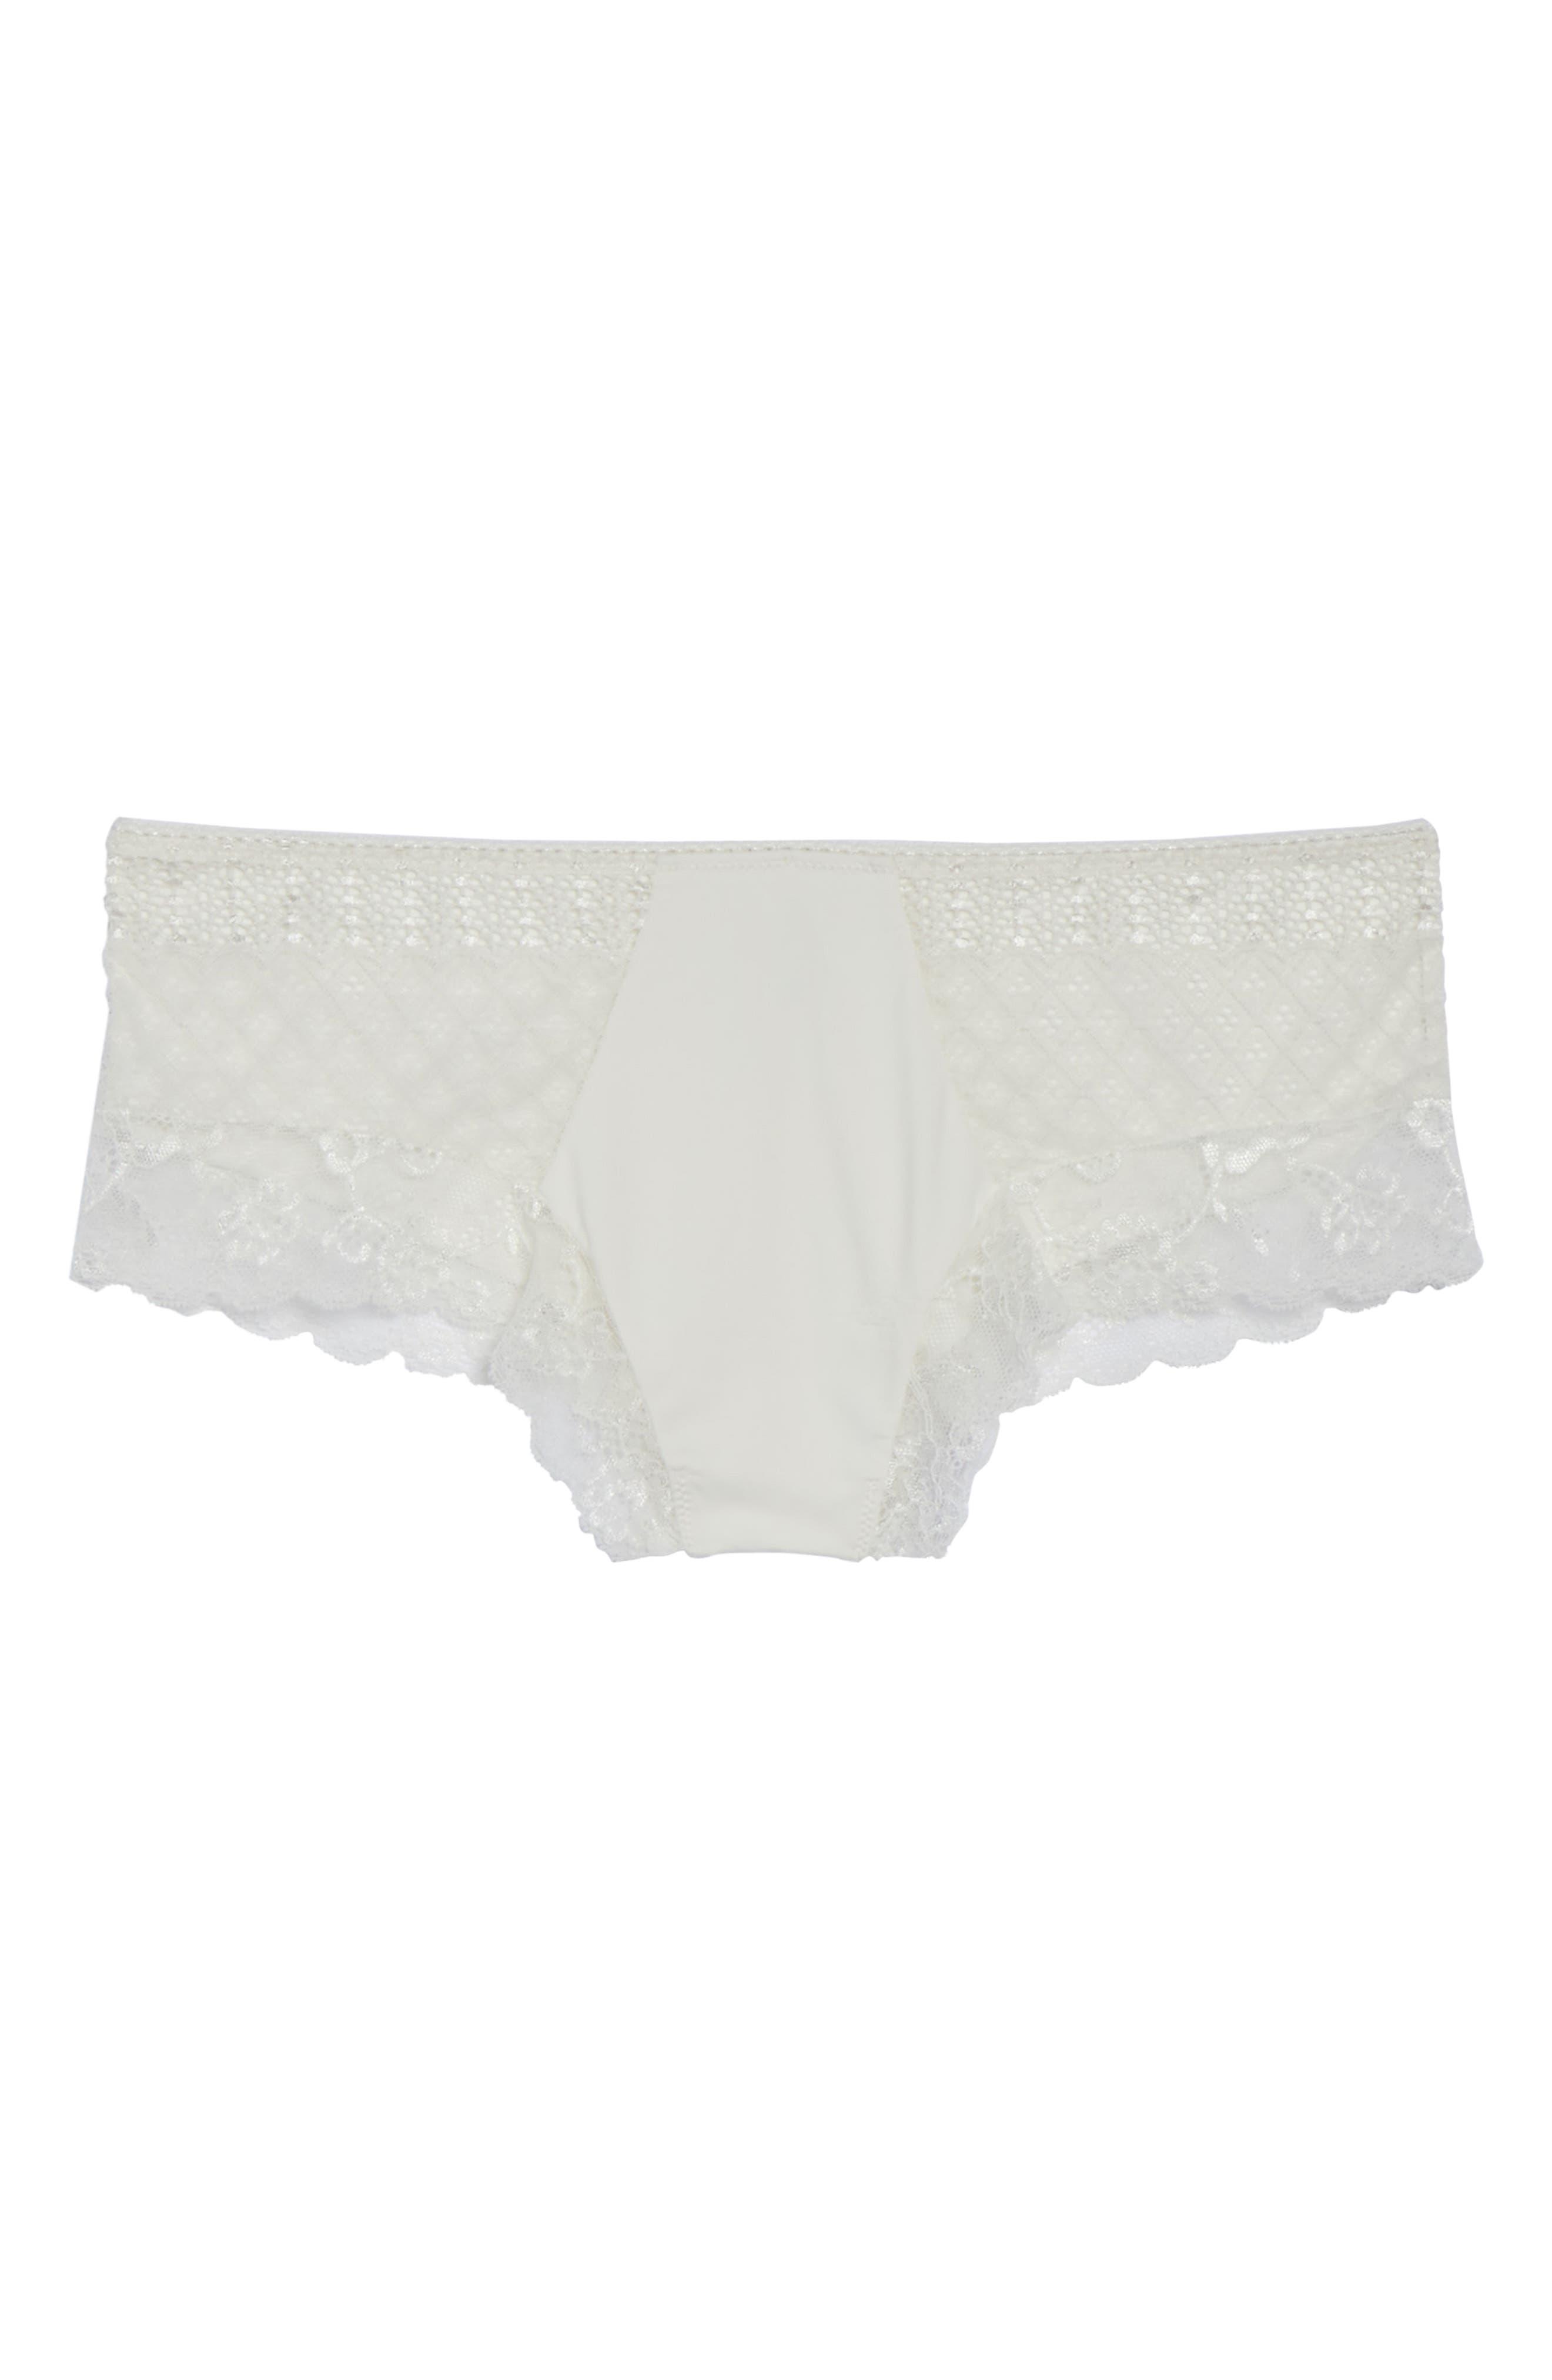 Alternate Image 4  - Honeydew Microfiber & Lace Hipster Panties (3 for $33)